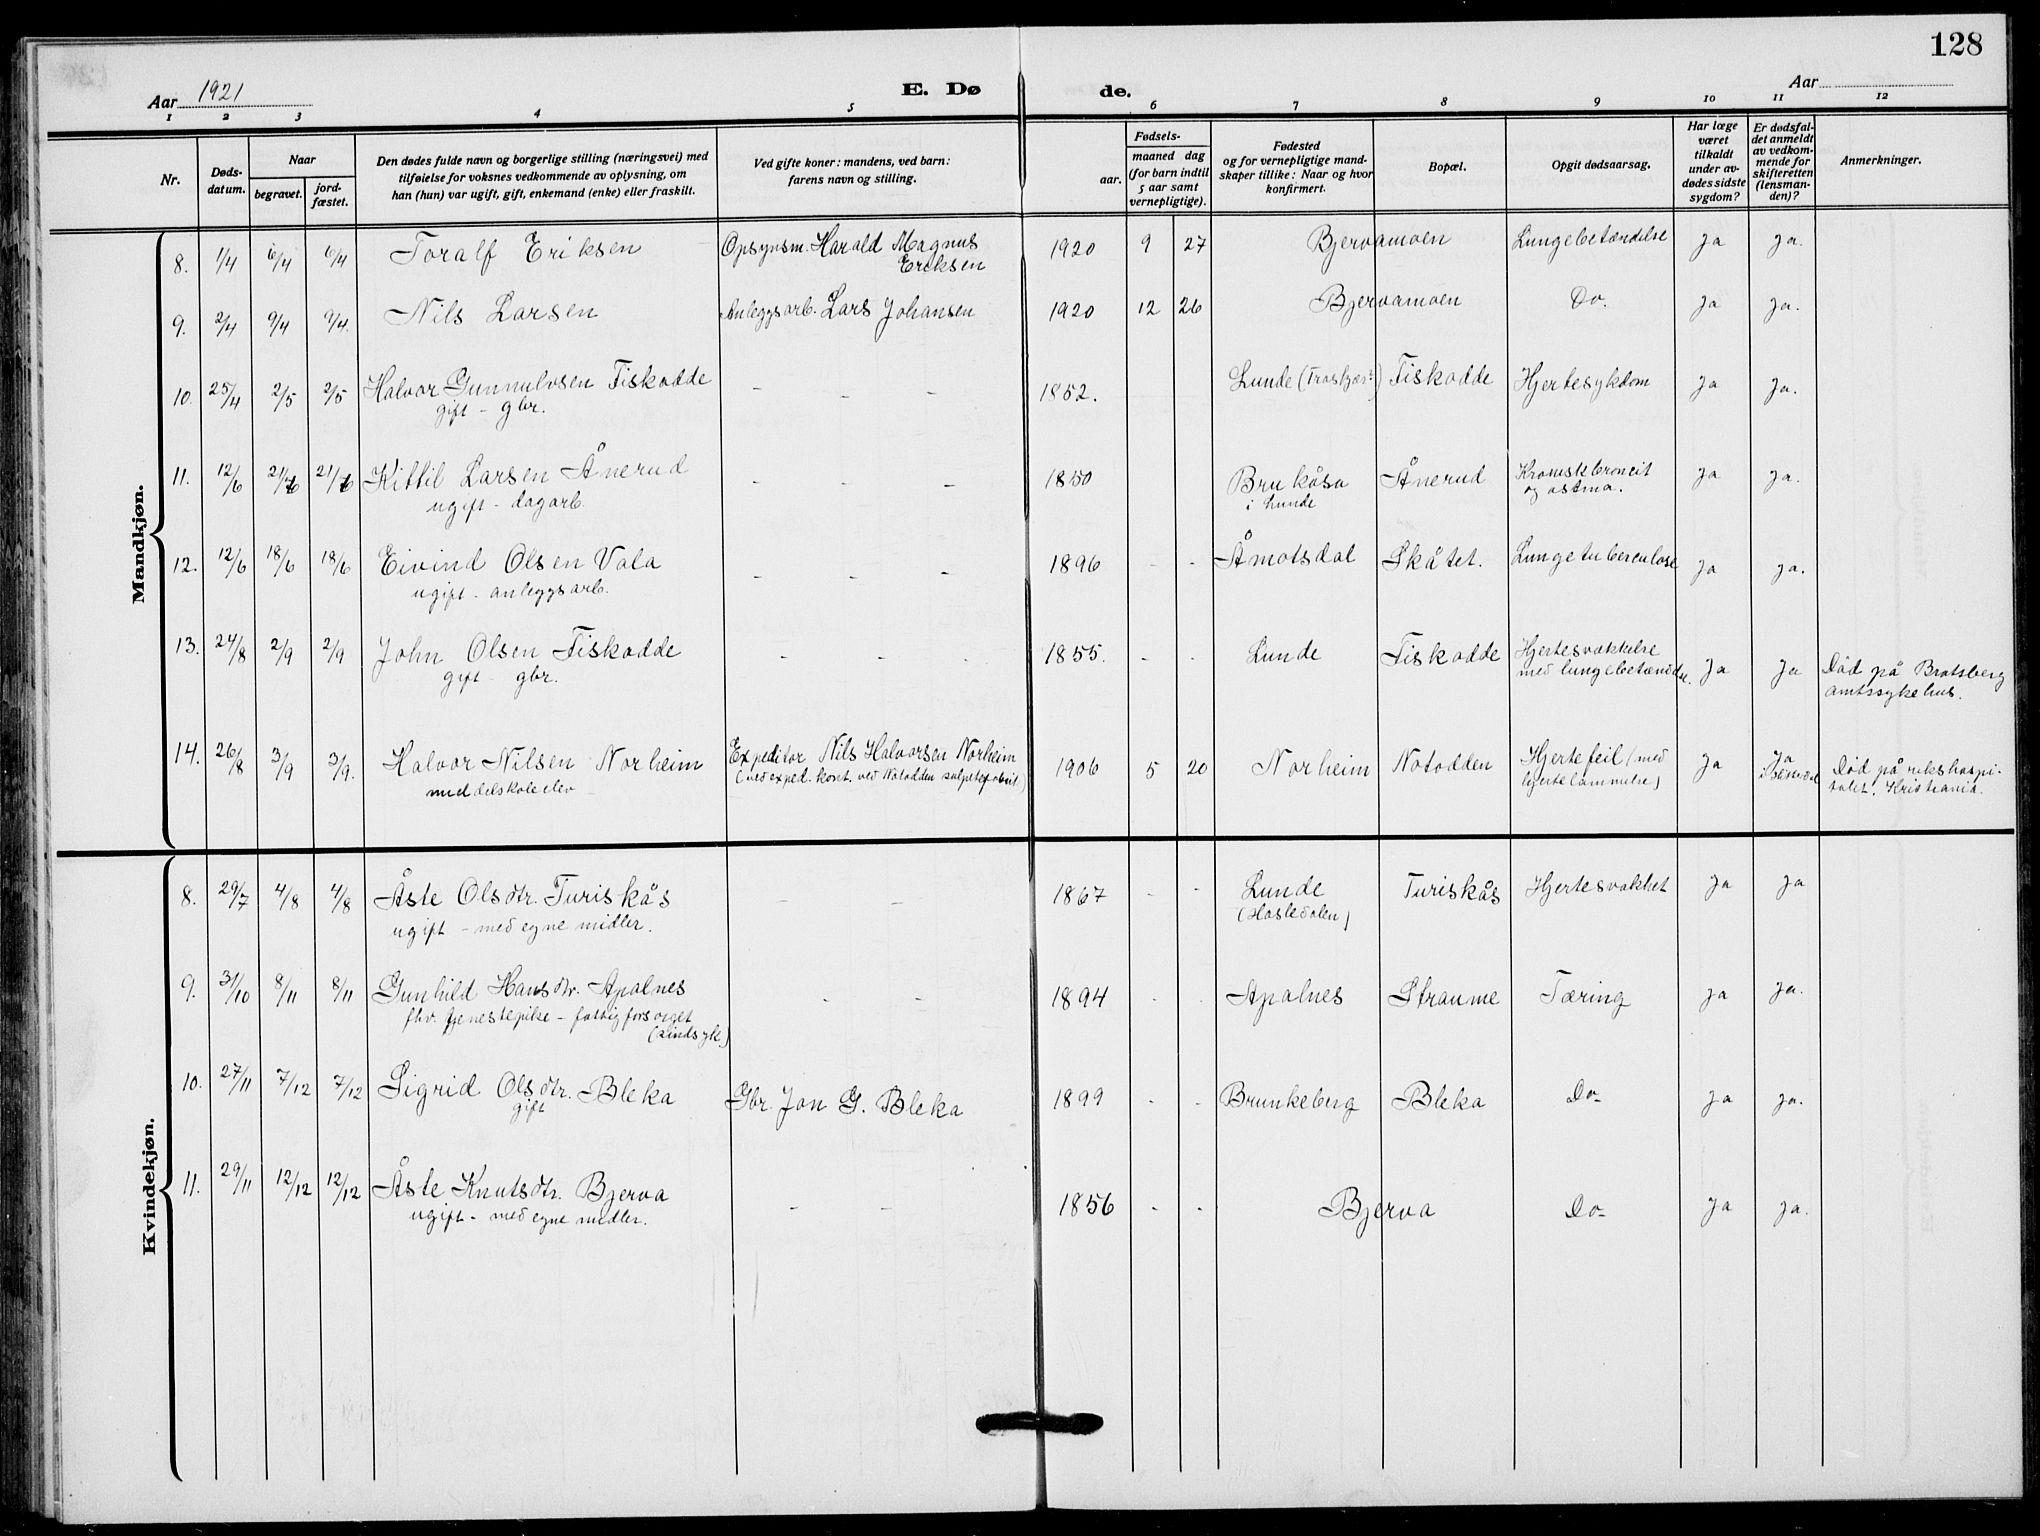 SAKO, Lunde kirkebøker, F/Fa/L0005: Parish register (official) no. I 5, 1914-1922, p. 128